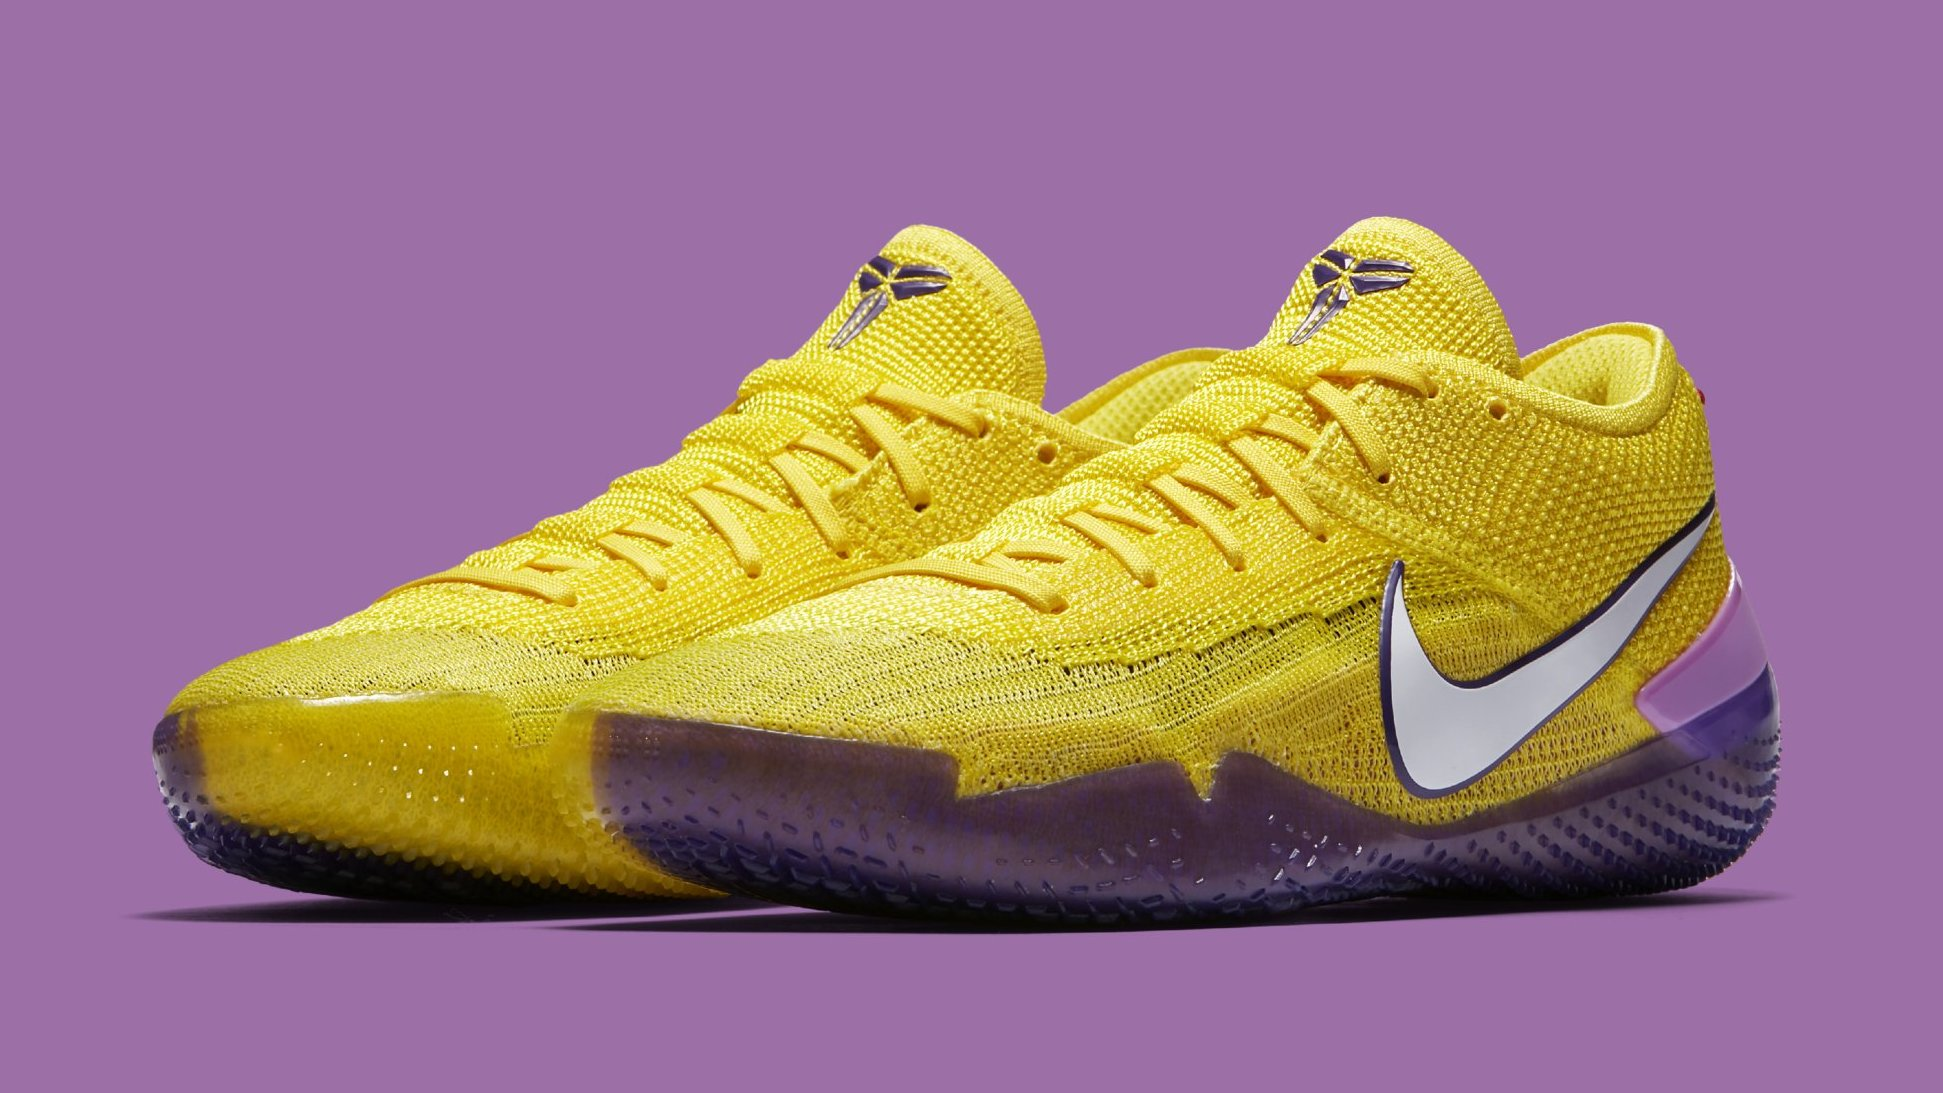 the best attitude ba203 ce5f9 Nike Kobe A.D. NXT 360 'Yellow Strike/White' AQ1087-100 Release Date ...